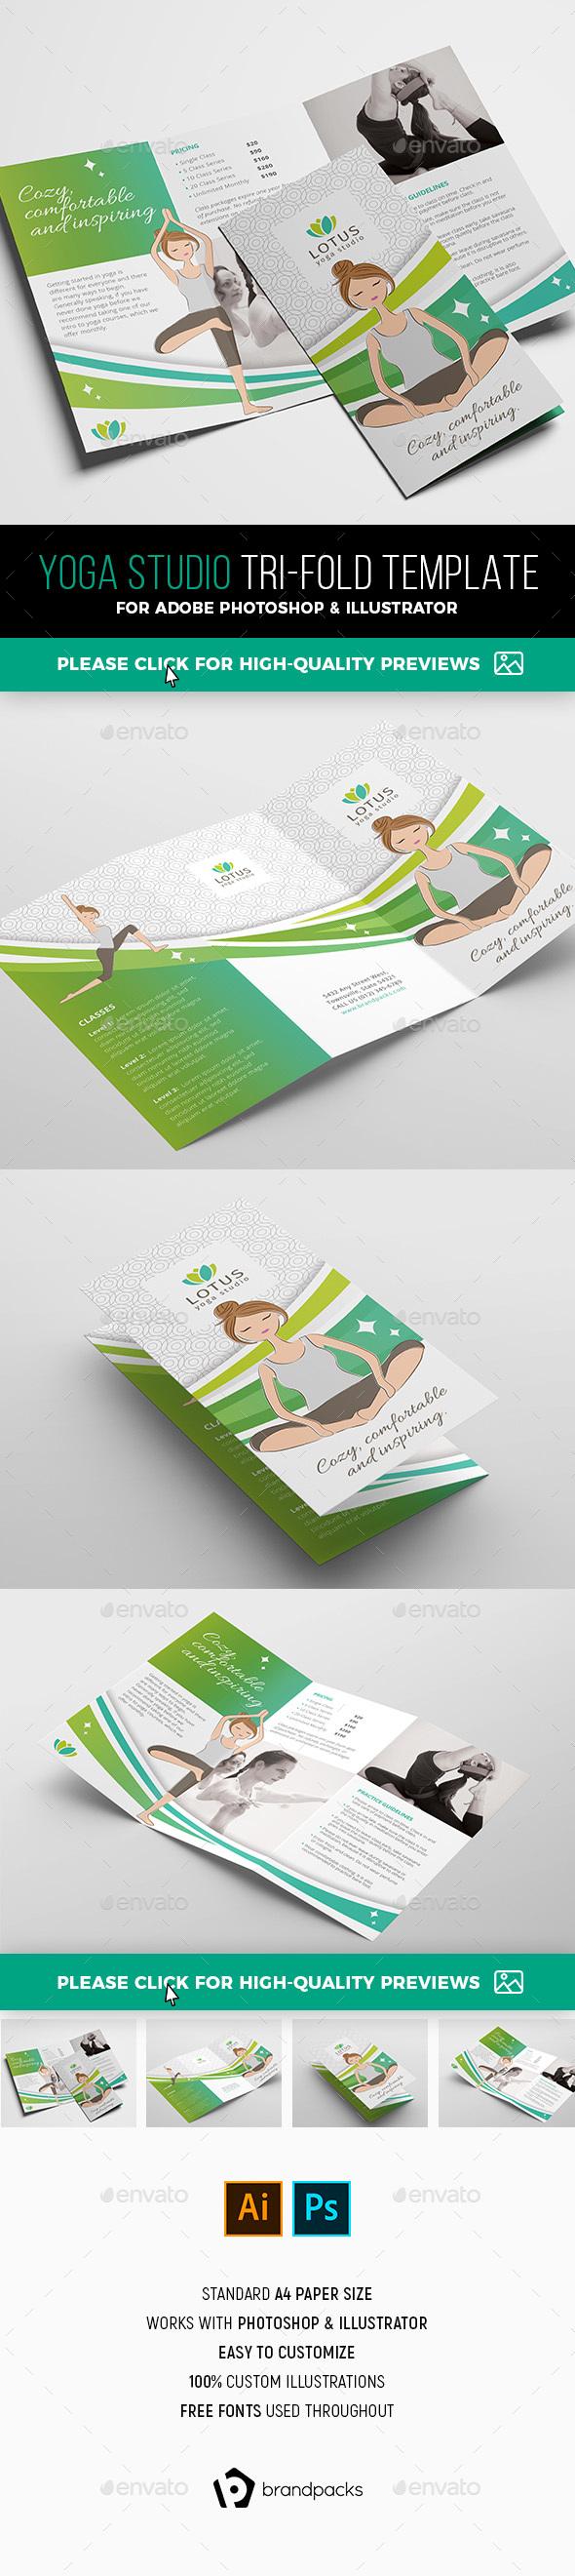 Yoga Studio Tri-Fold Brochure Template - Informational Brochures